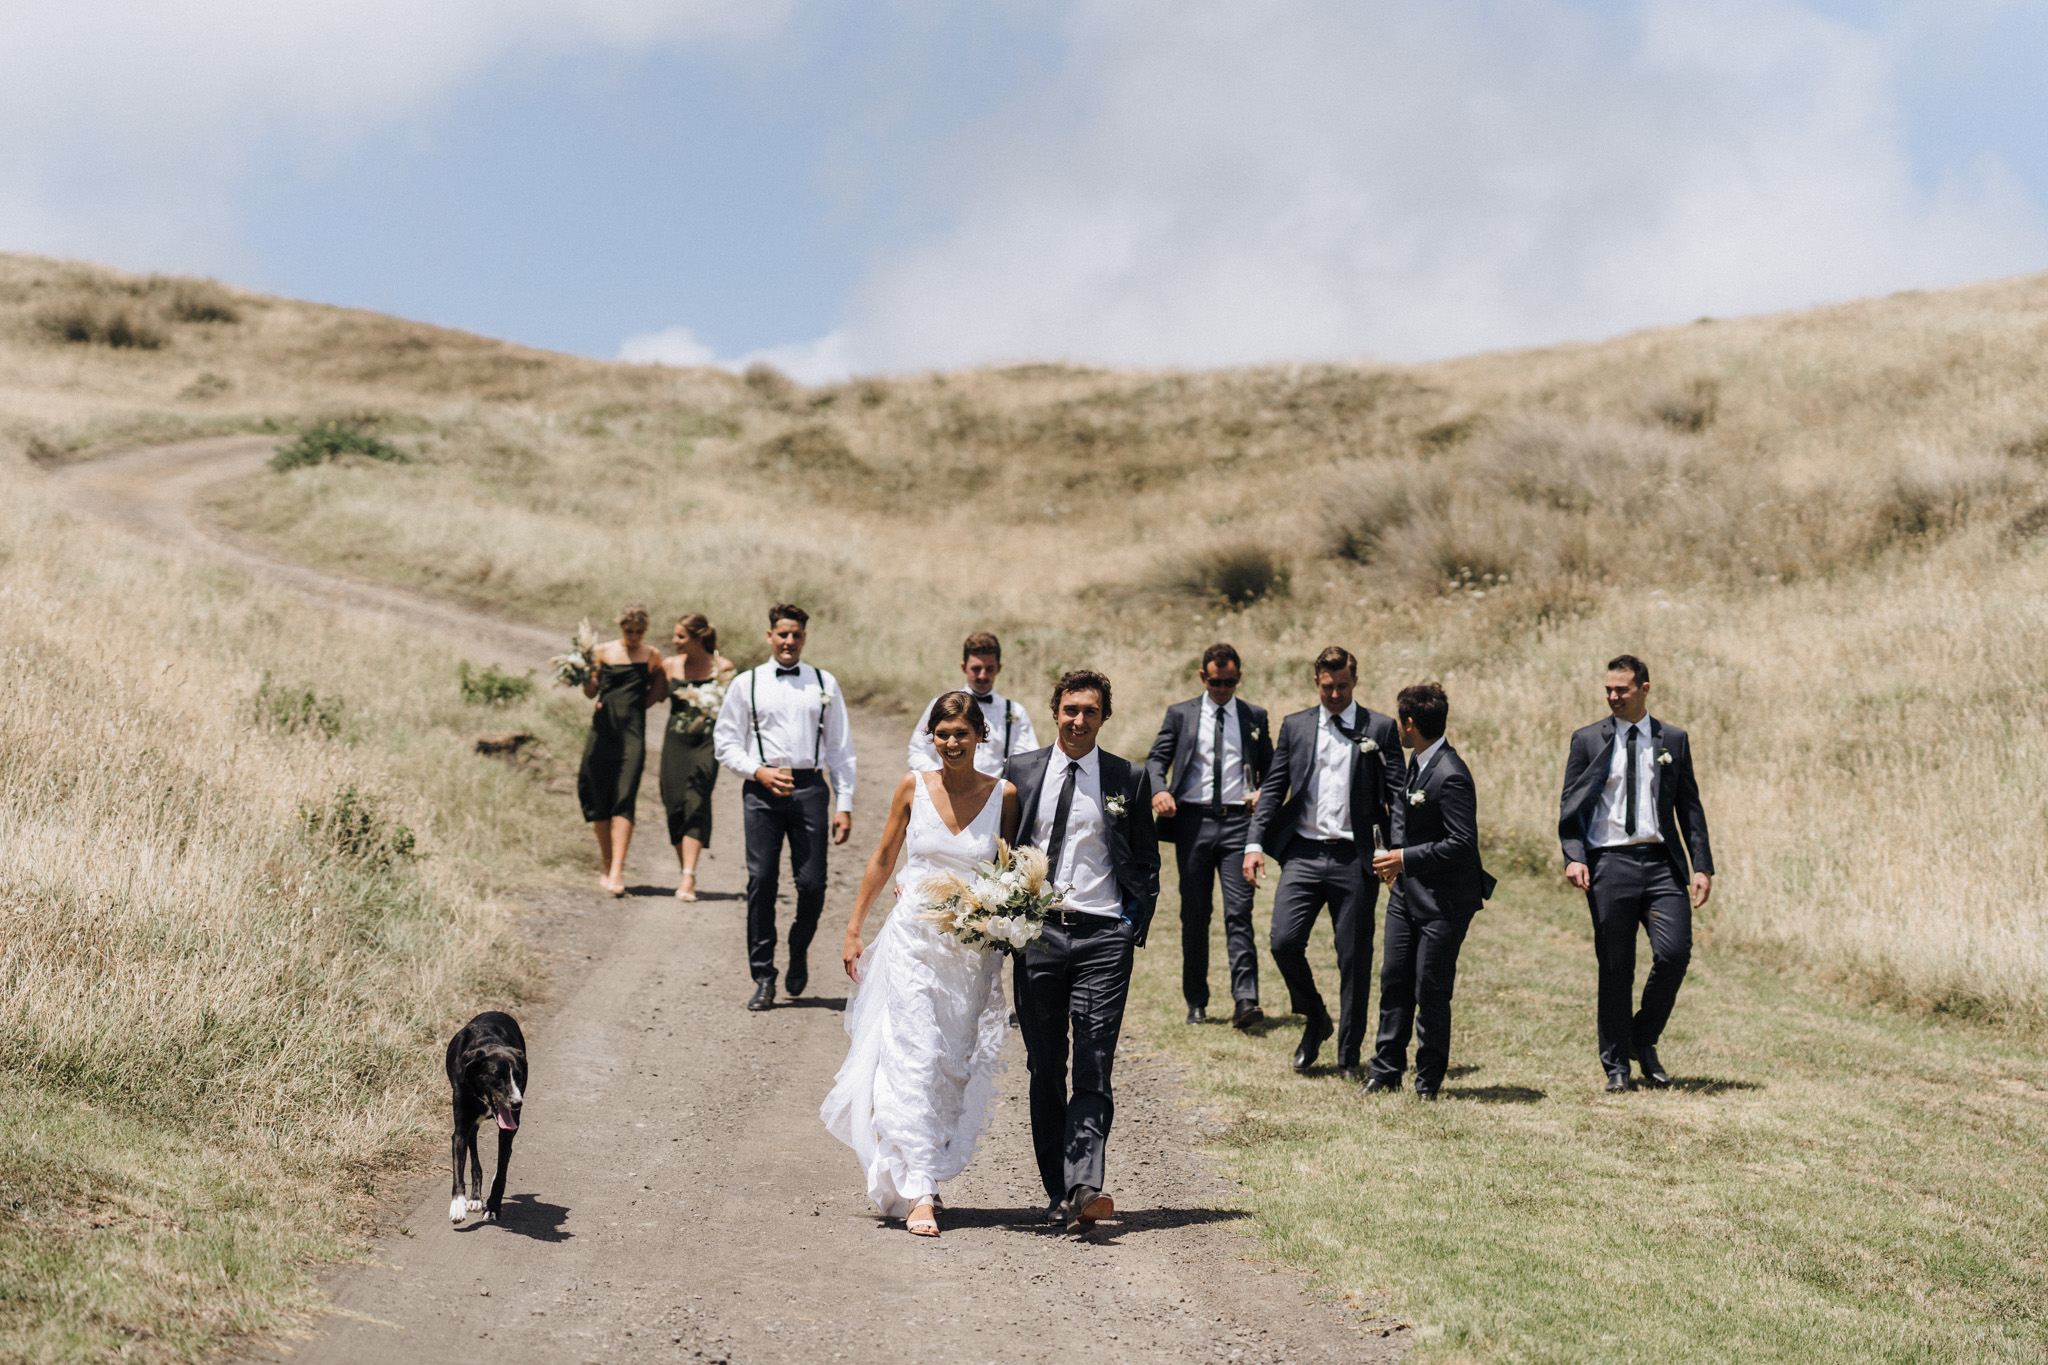 newfound-h-m-castaways-waiuku-auckland-wedding-photographer-62